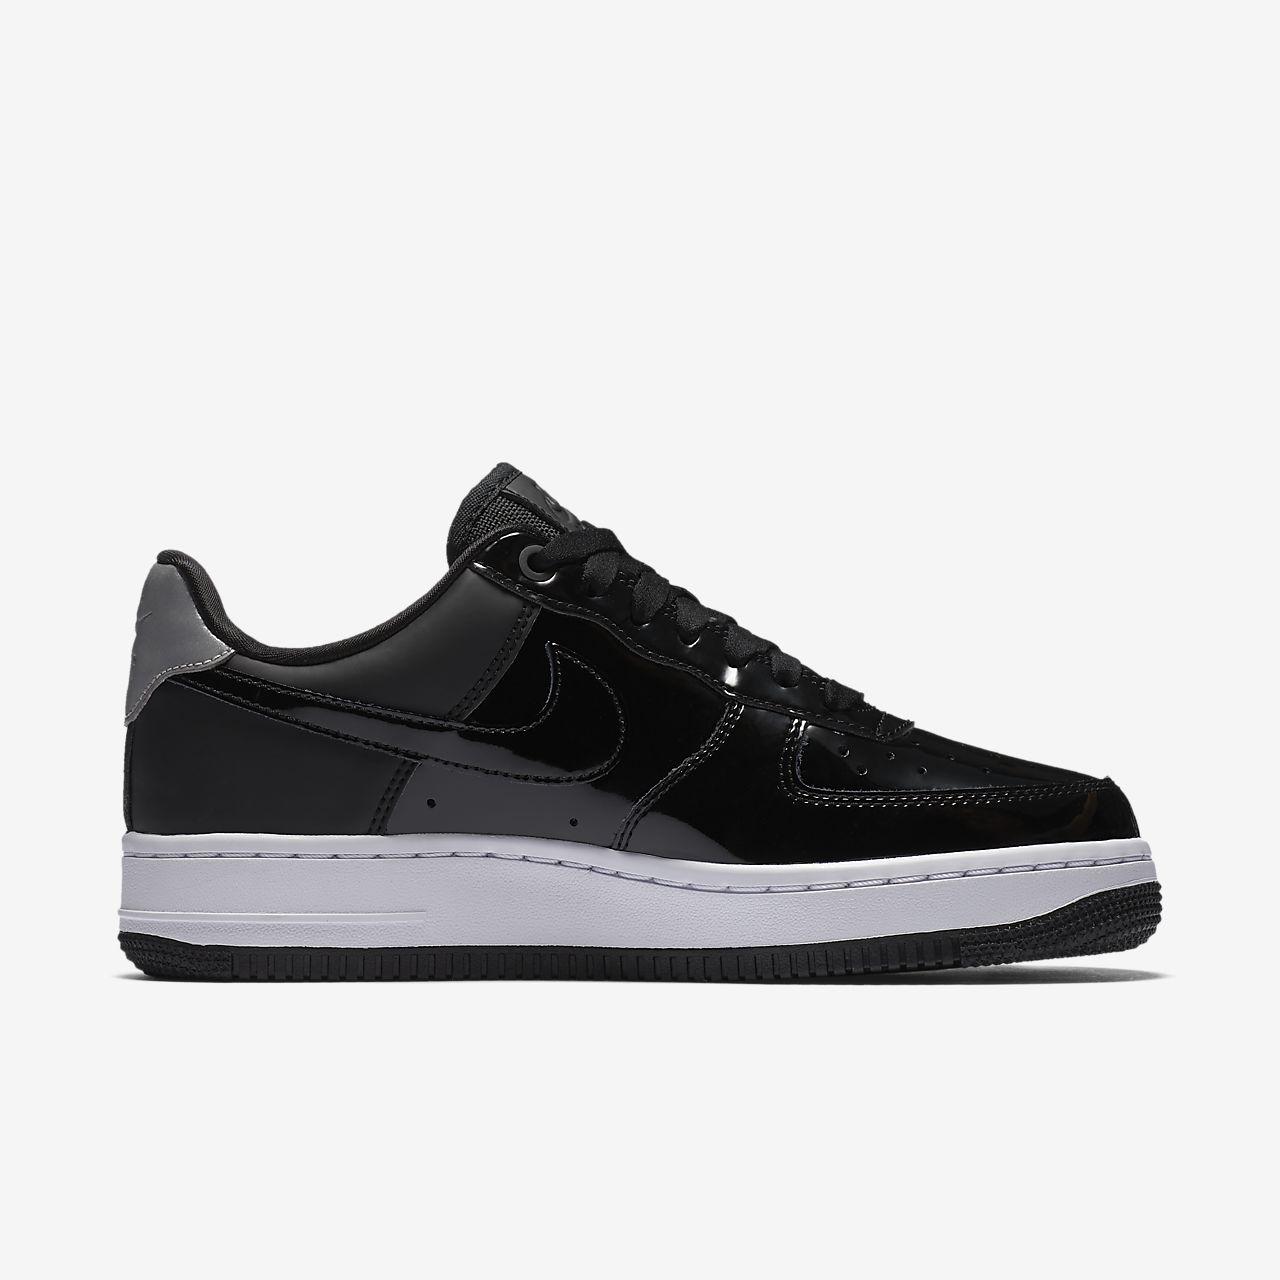 ... Nike Air Force 1 '07 SE Premium Women's Shoe